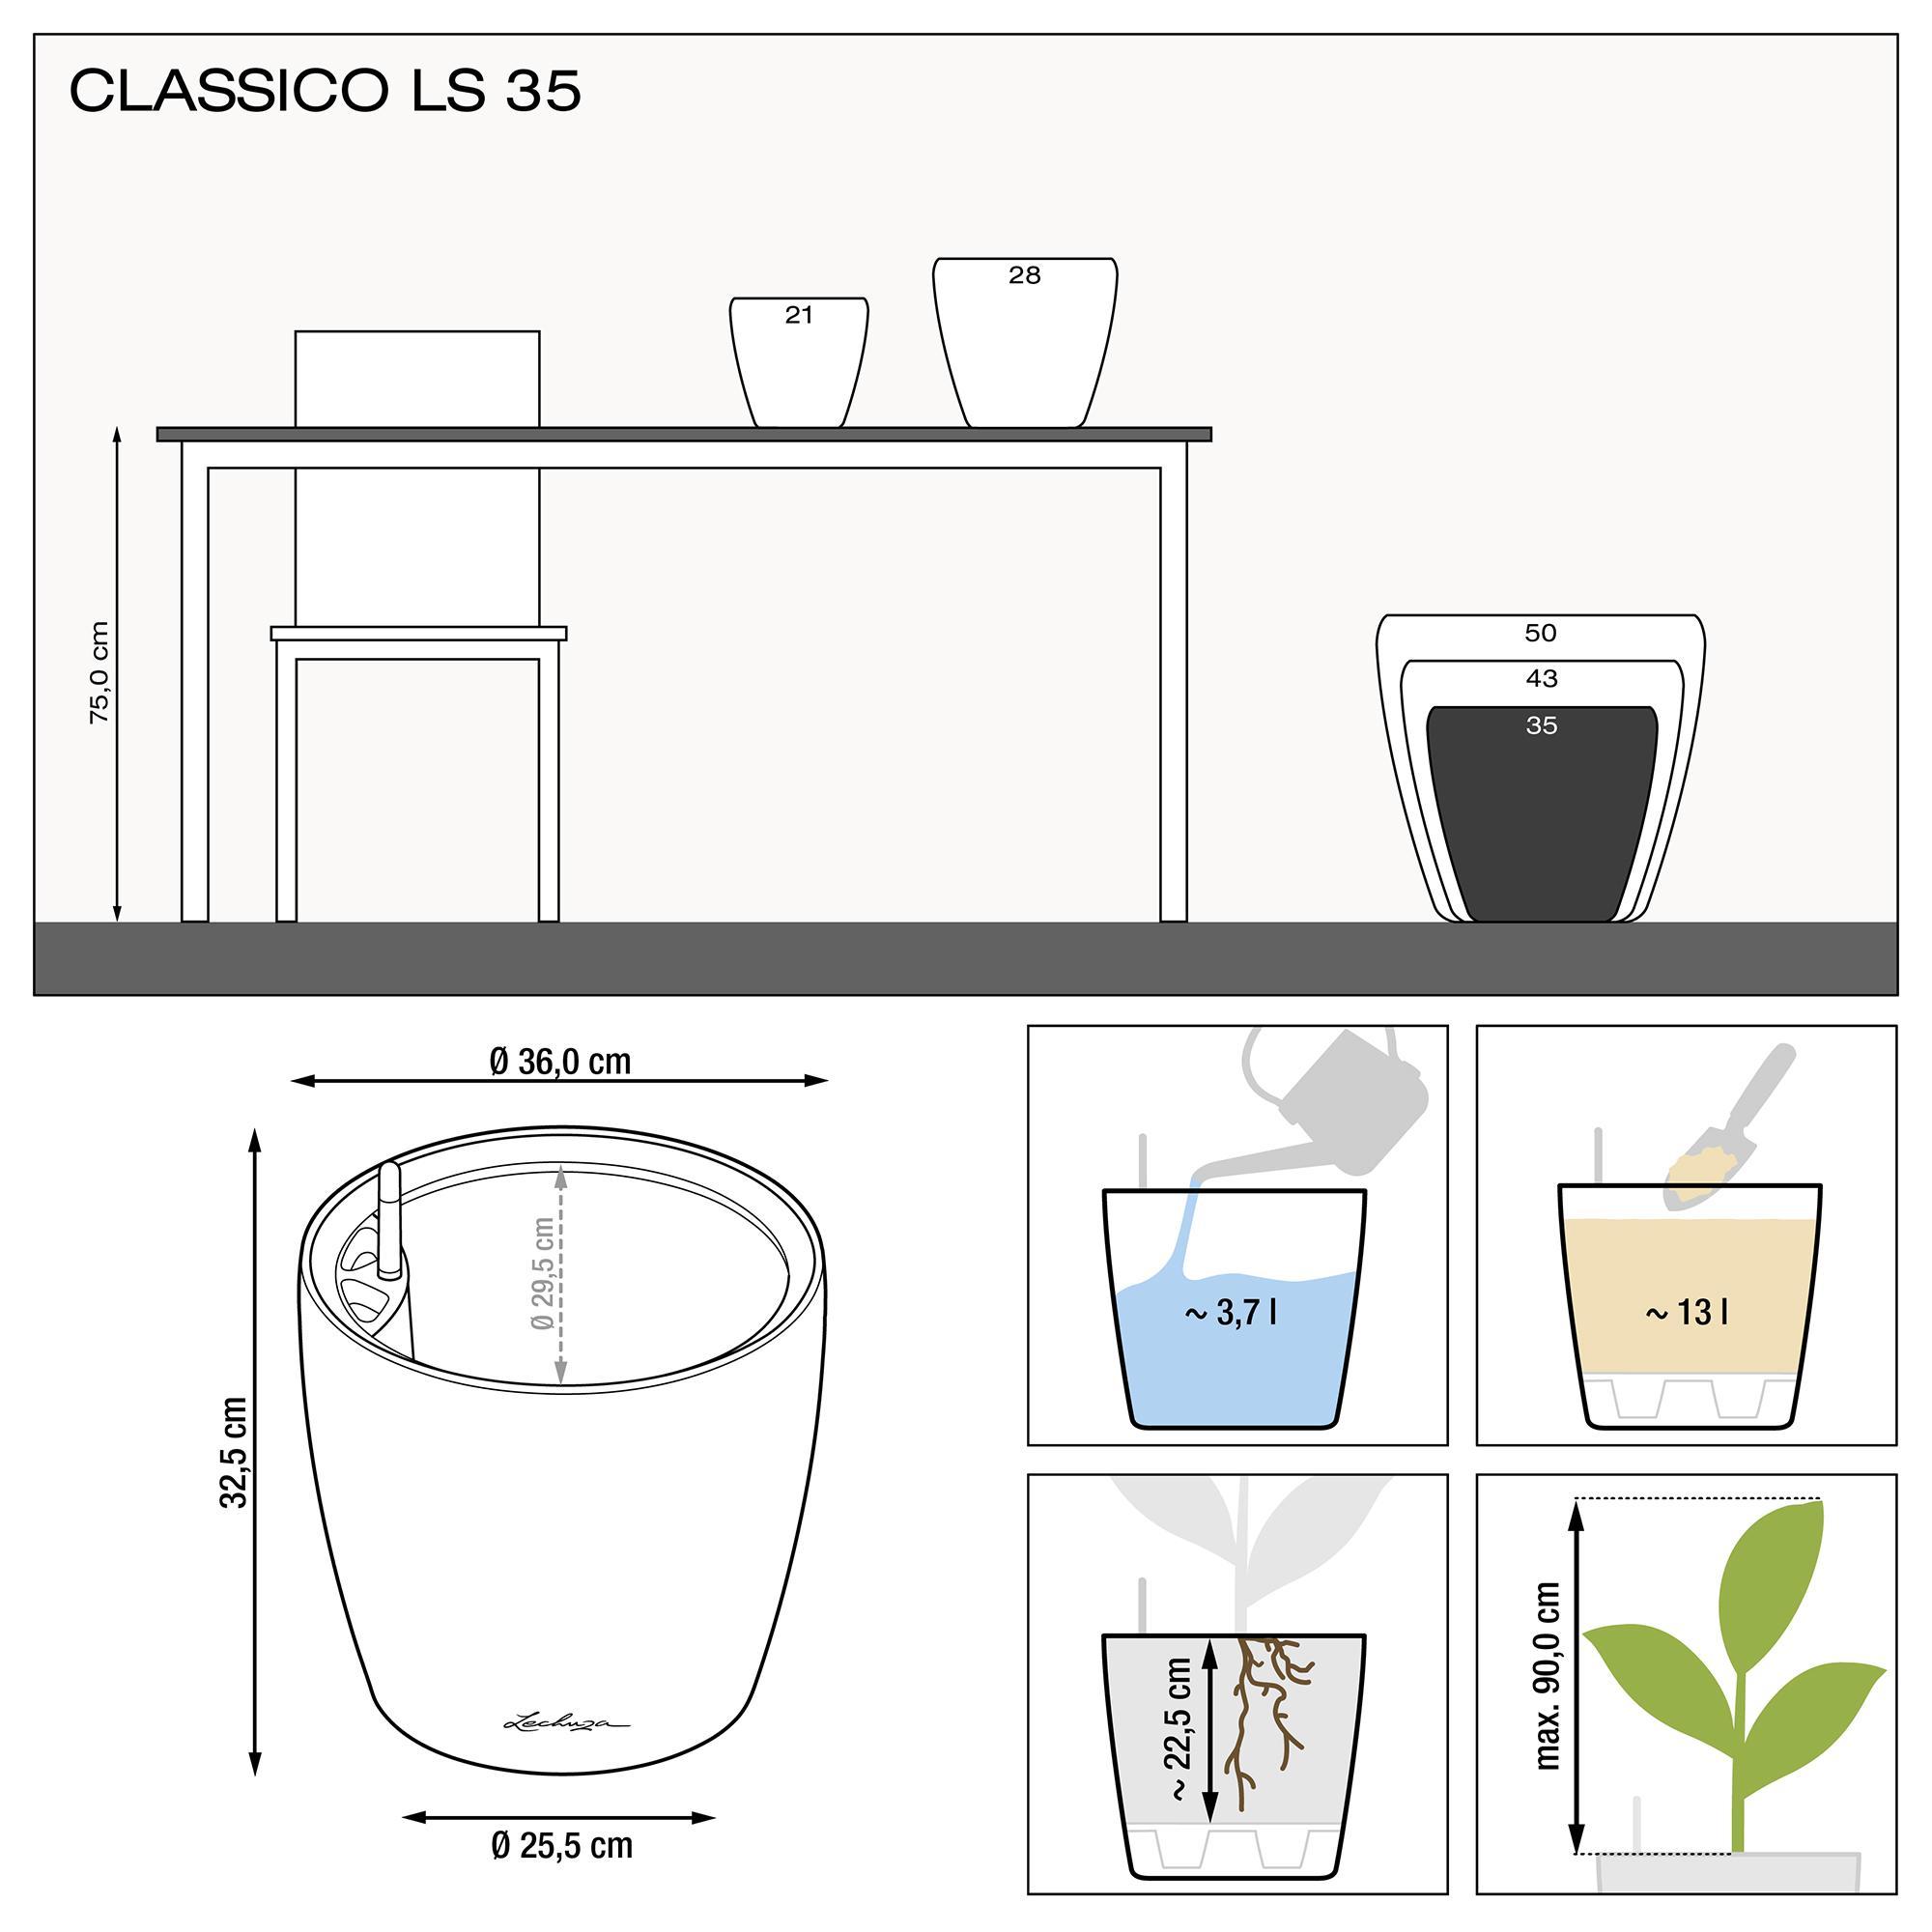 CLASSICO LS 35 antracita metalizado - Imagen 3